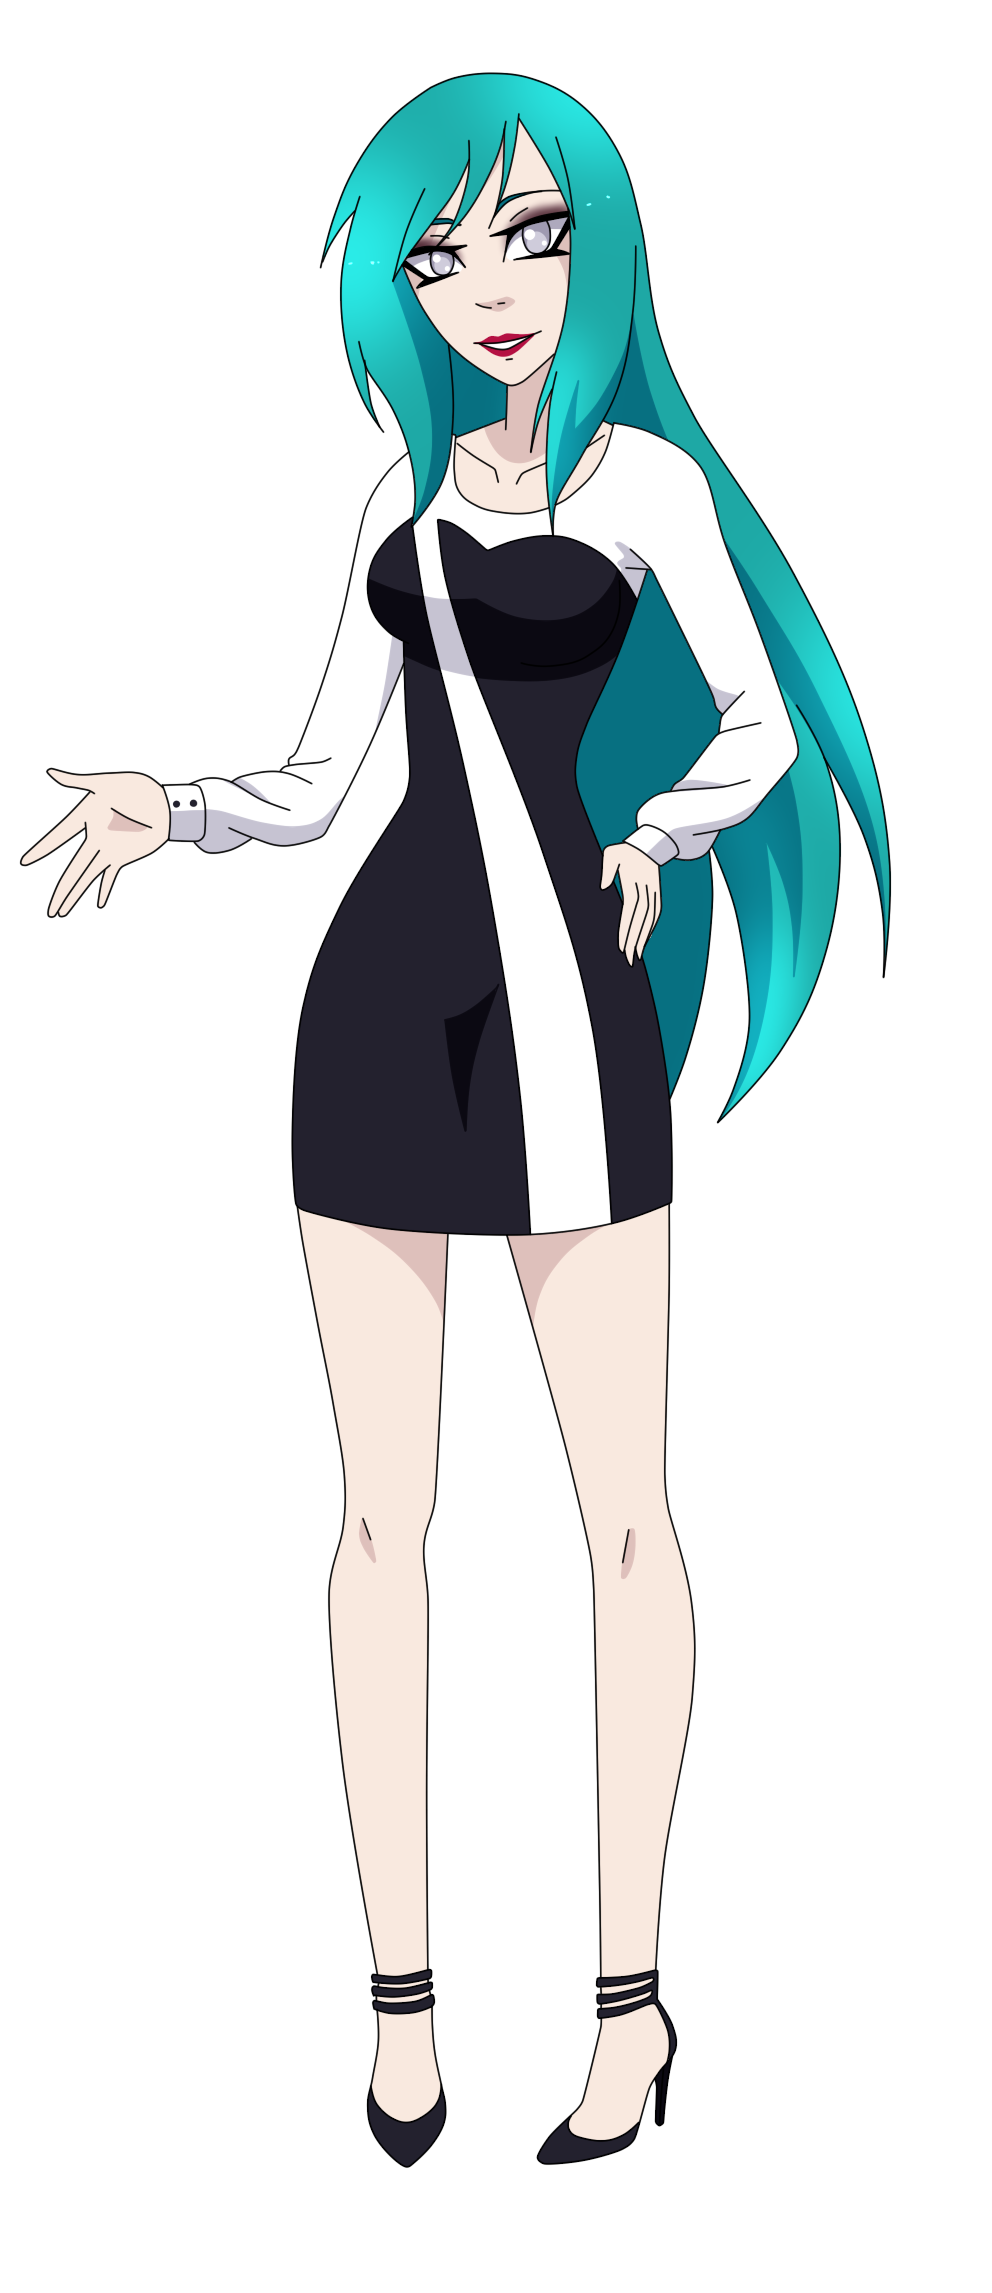 Fanye Date Outfit By Gaarasninjagirl On DeviantArt